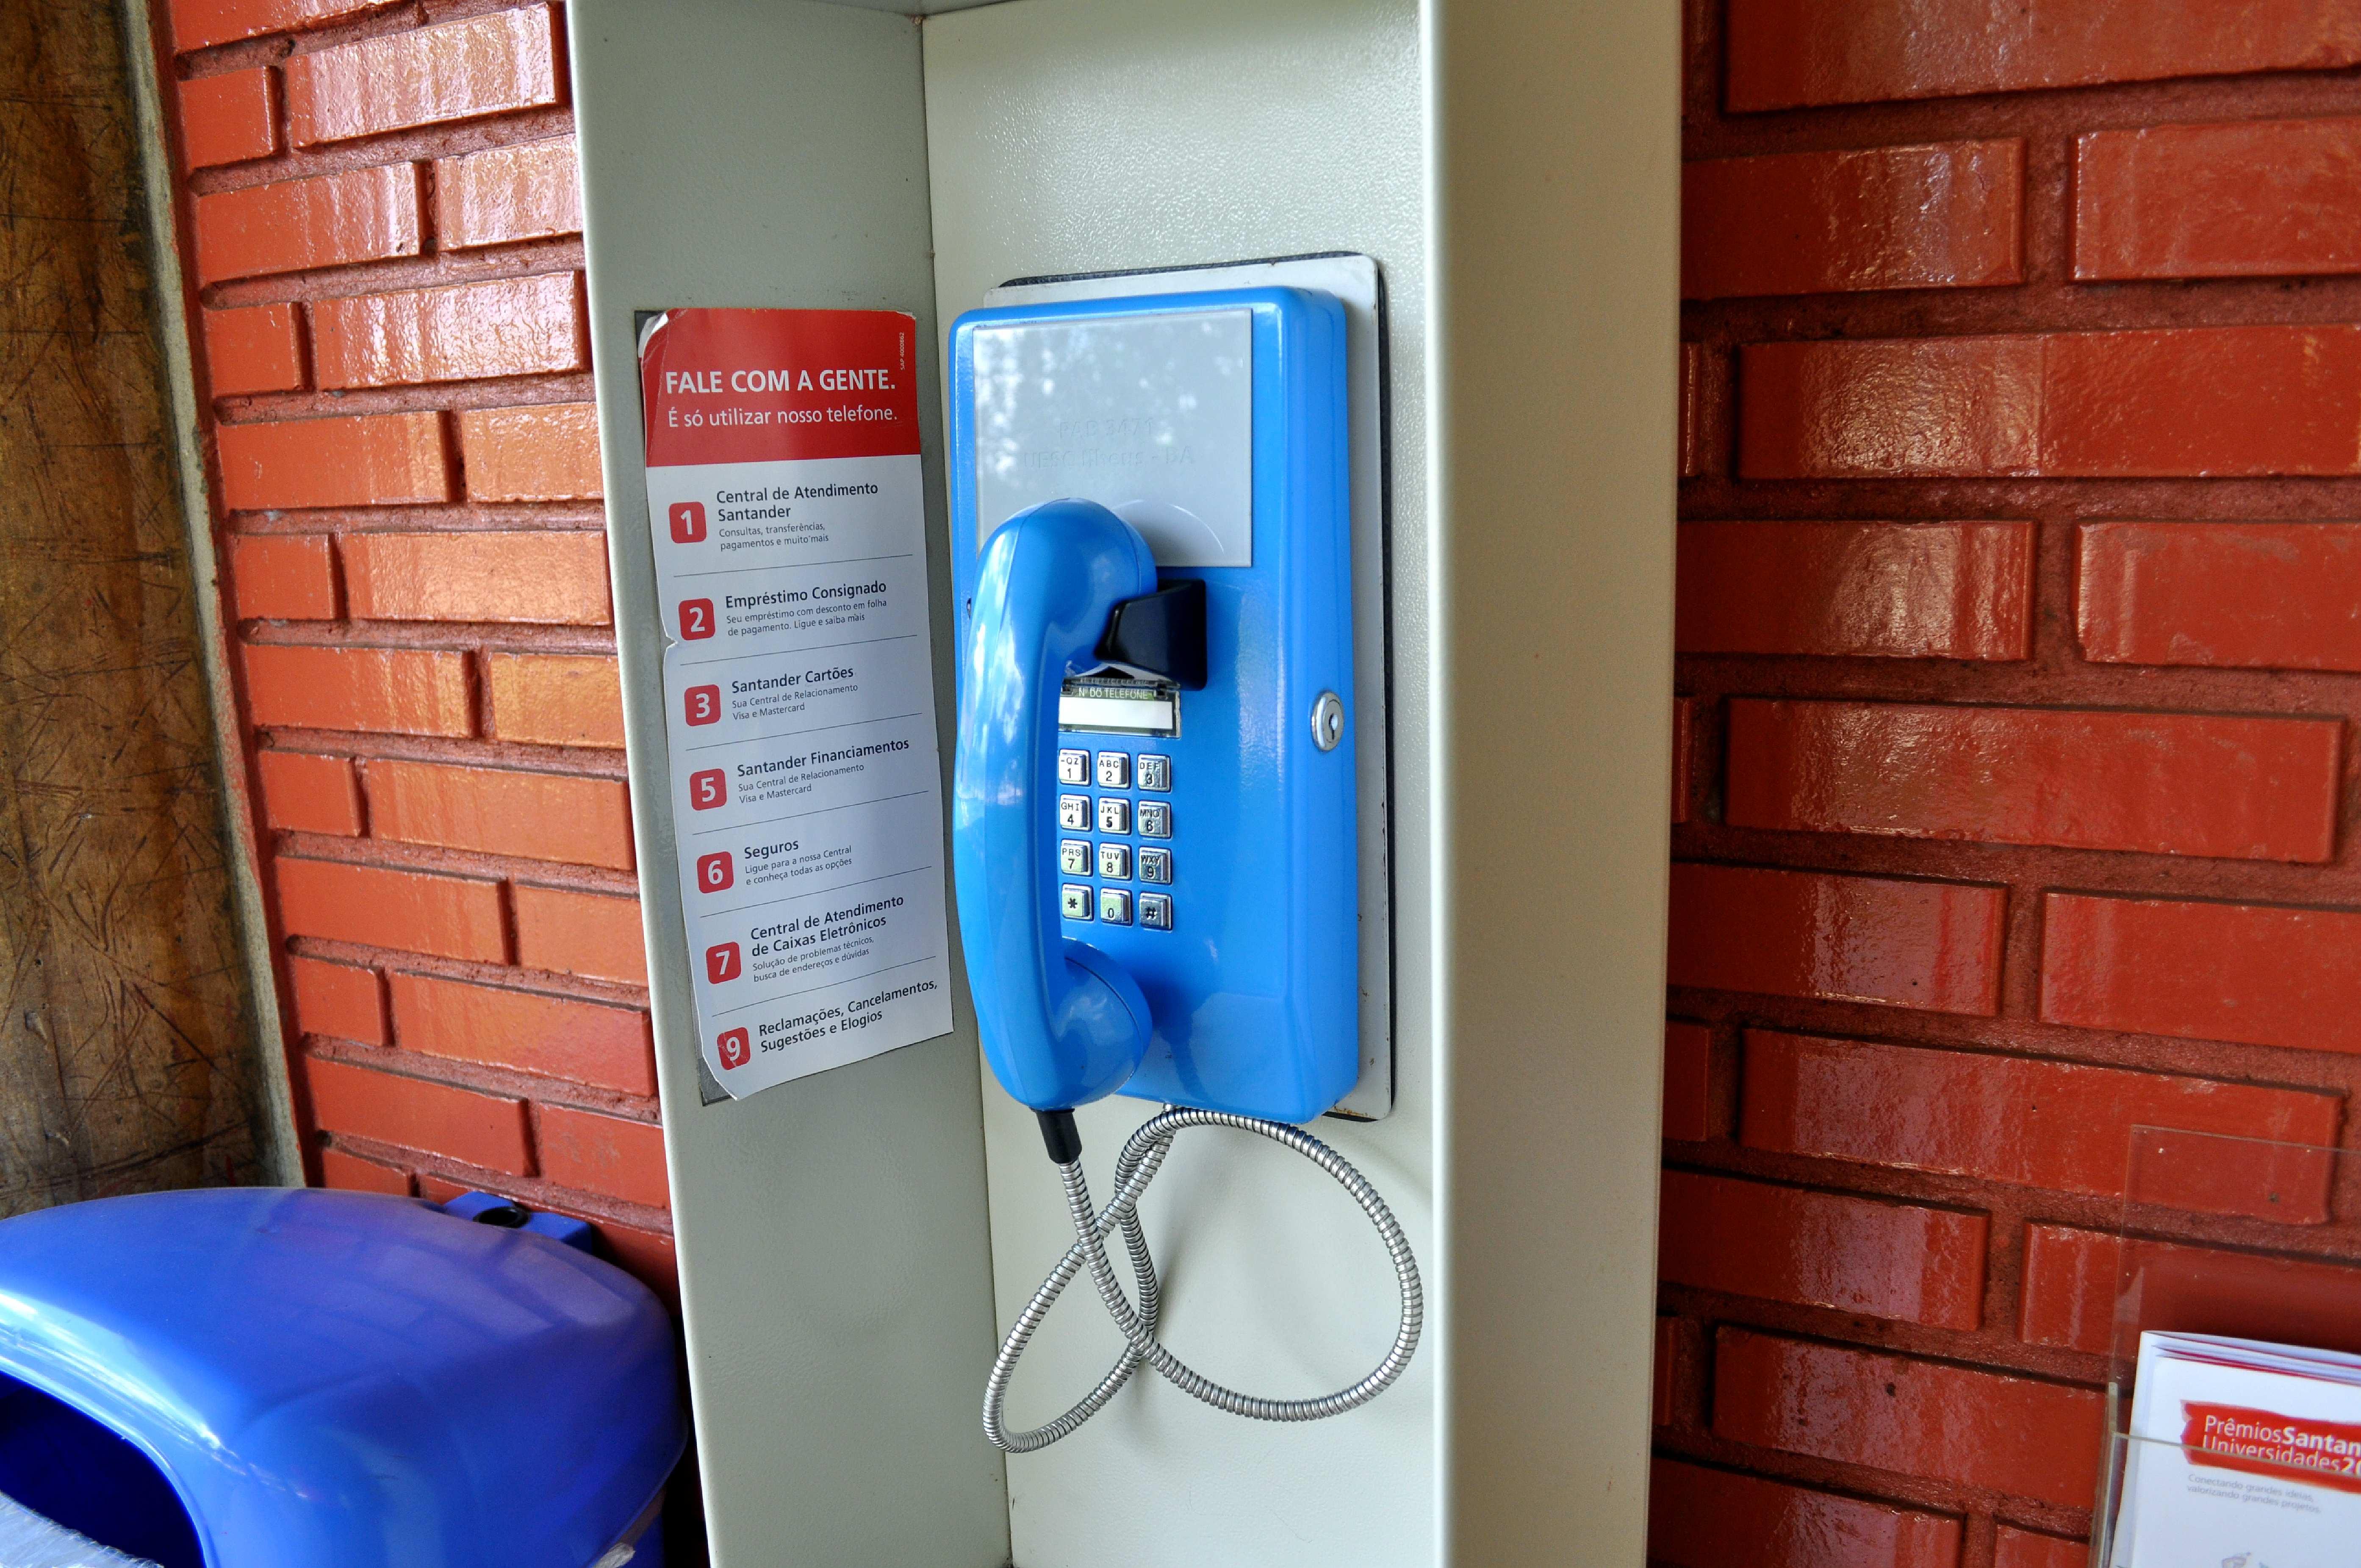 Foto gratis blu telefono parete for Camera dei deputati telefono